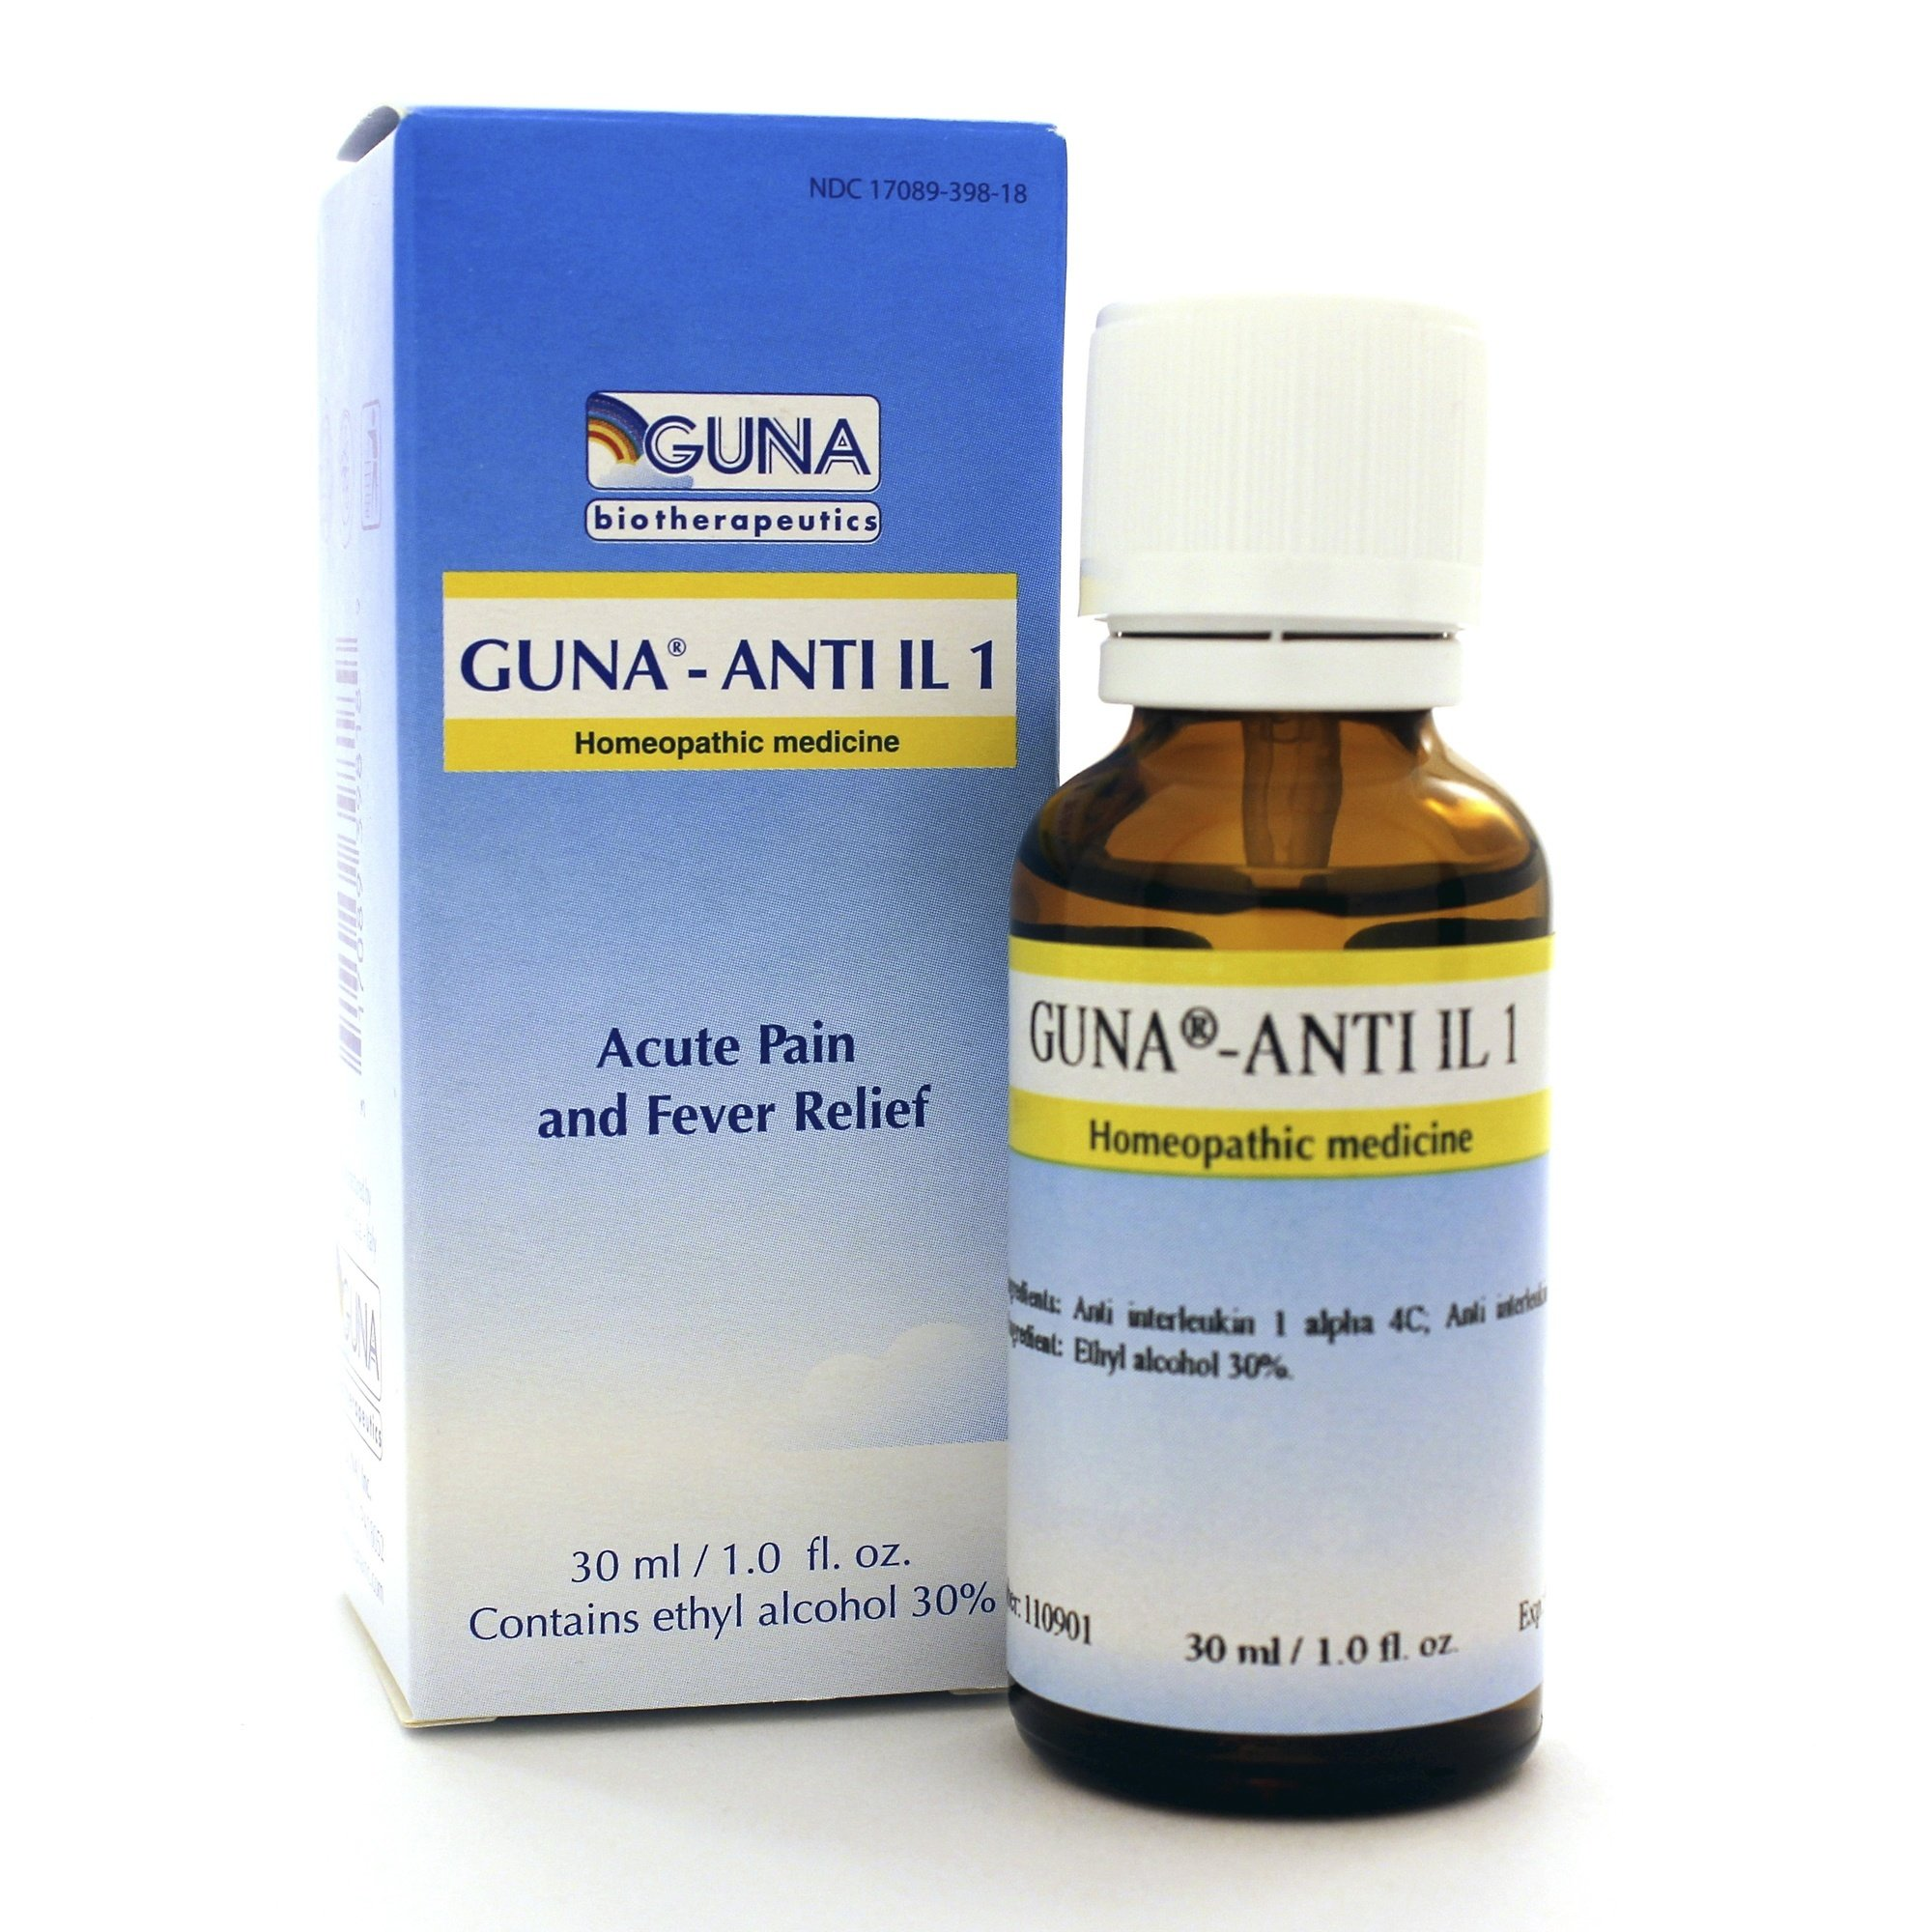 Guna Anti-Interleukin 1 30 Milliliters - Pack of 2